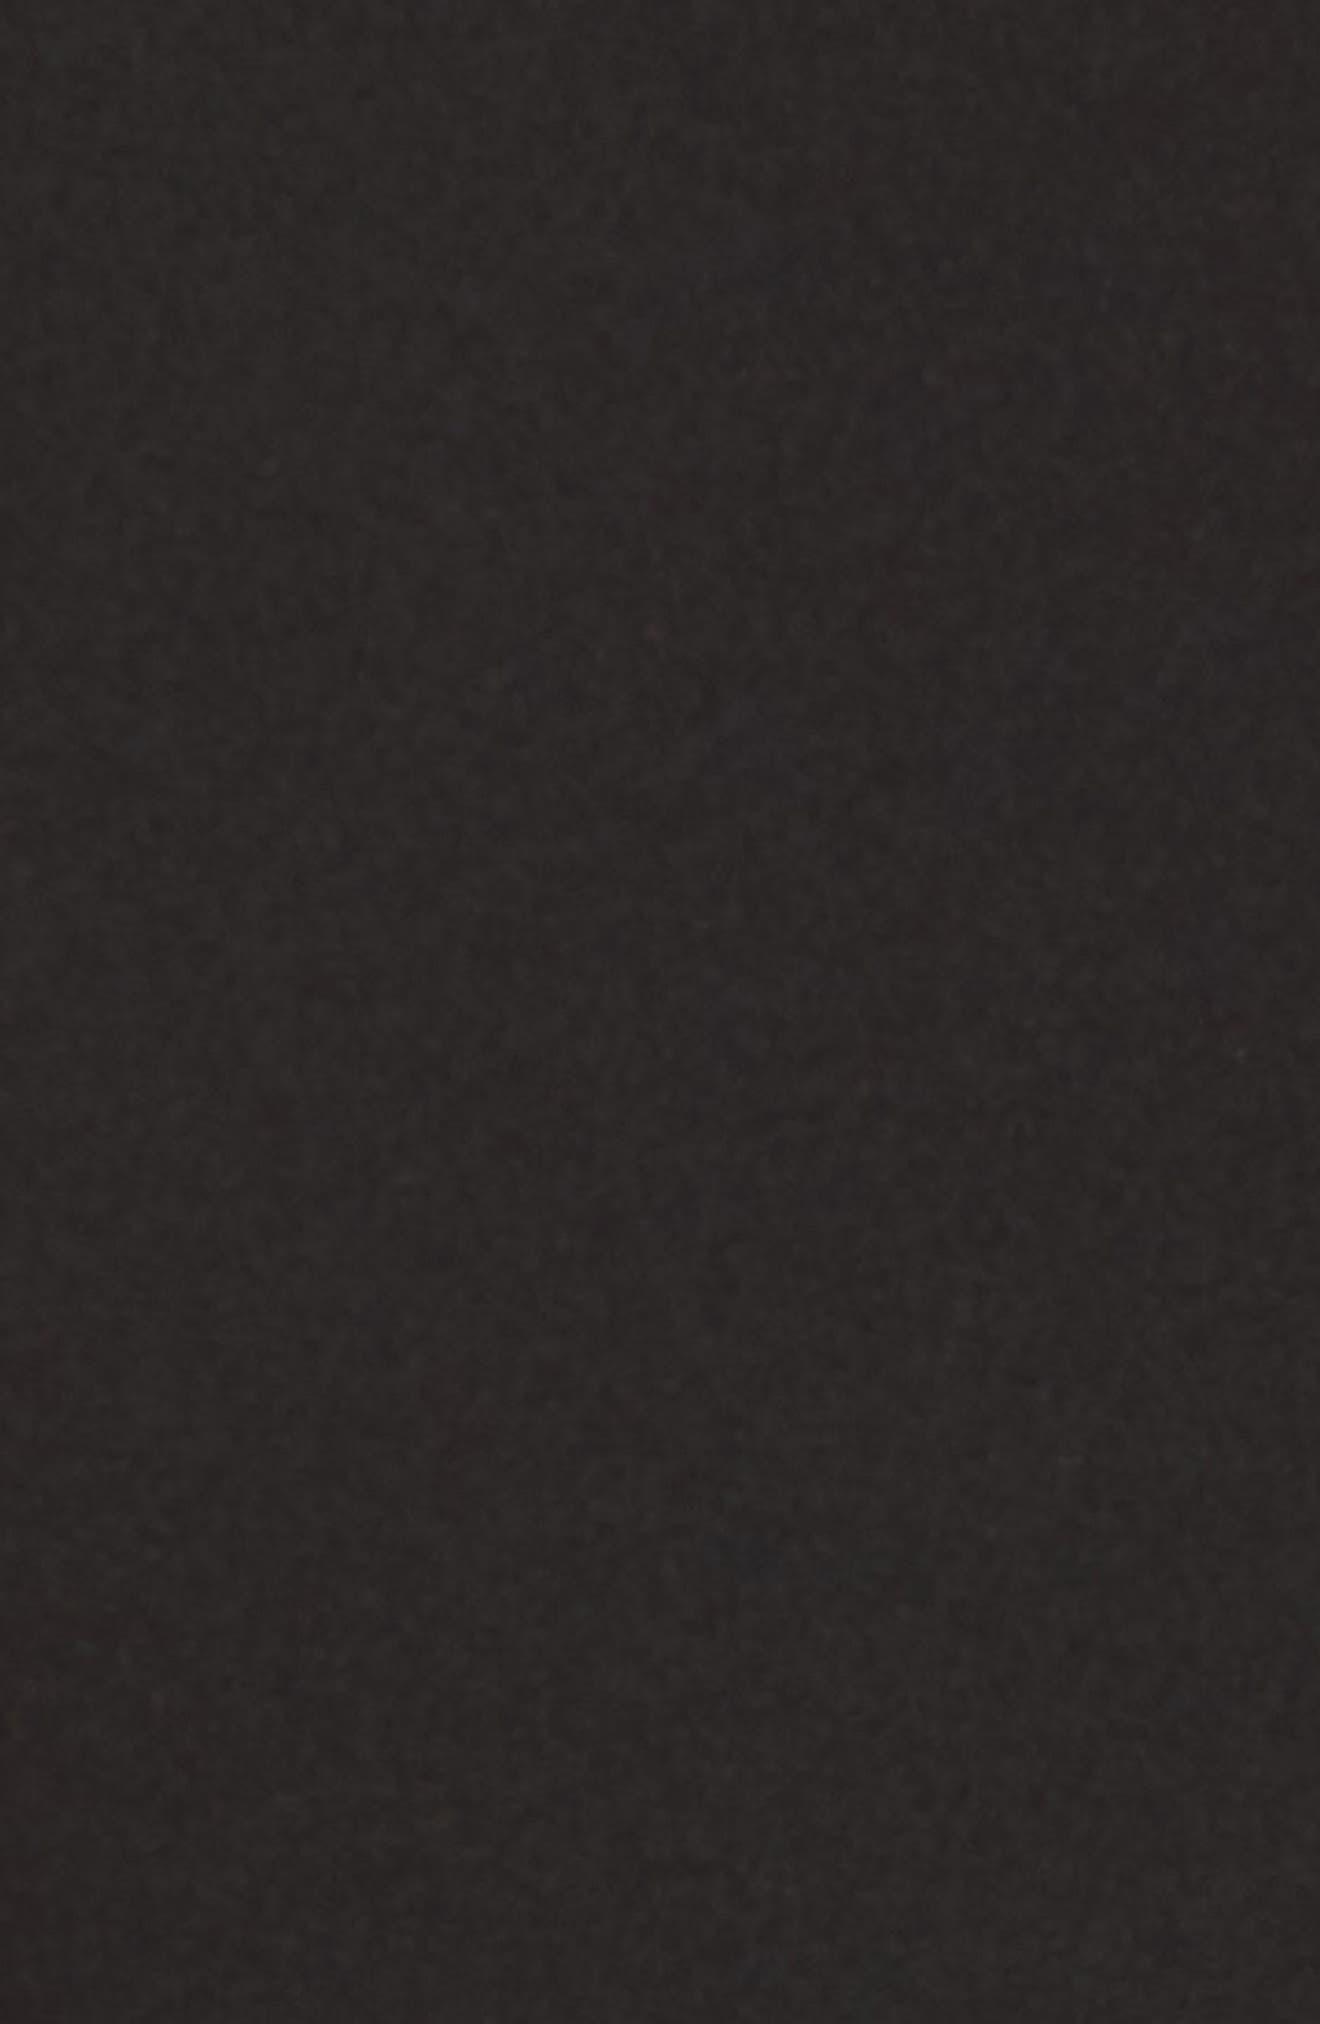 Choker One-Shoulder Dress,                             Alternate thumbnail 5, color,                             001